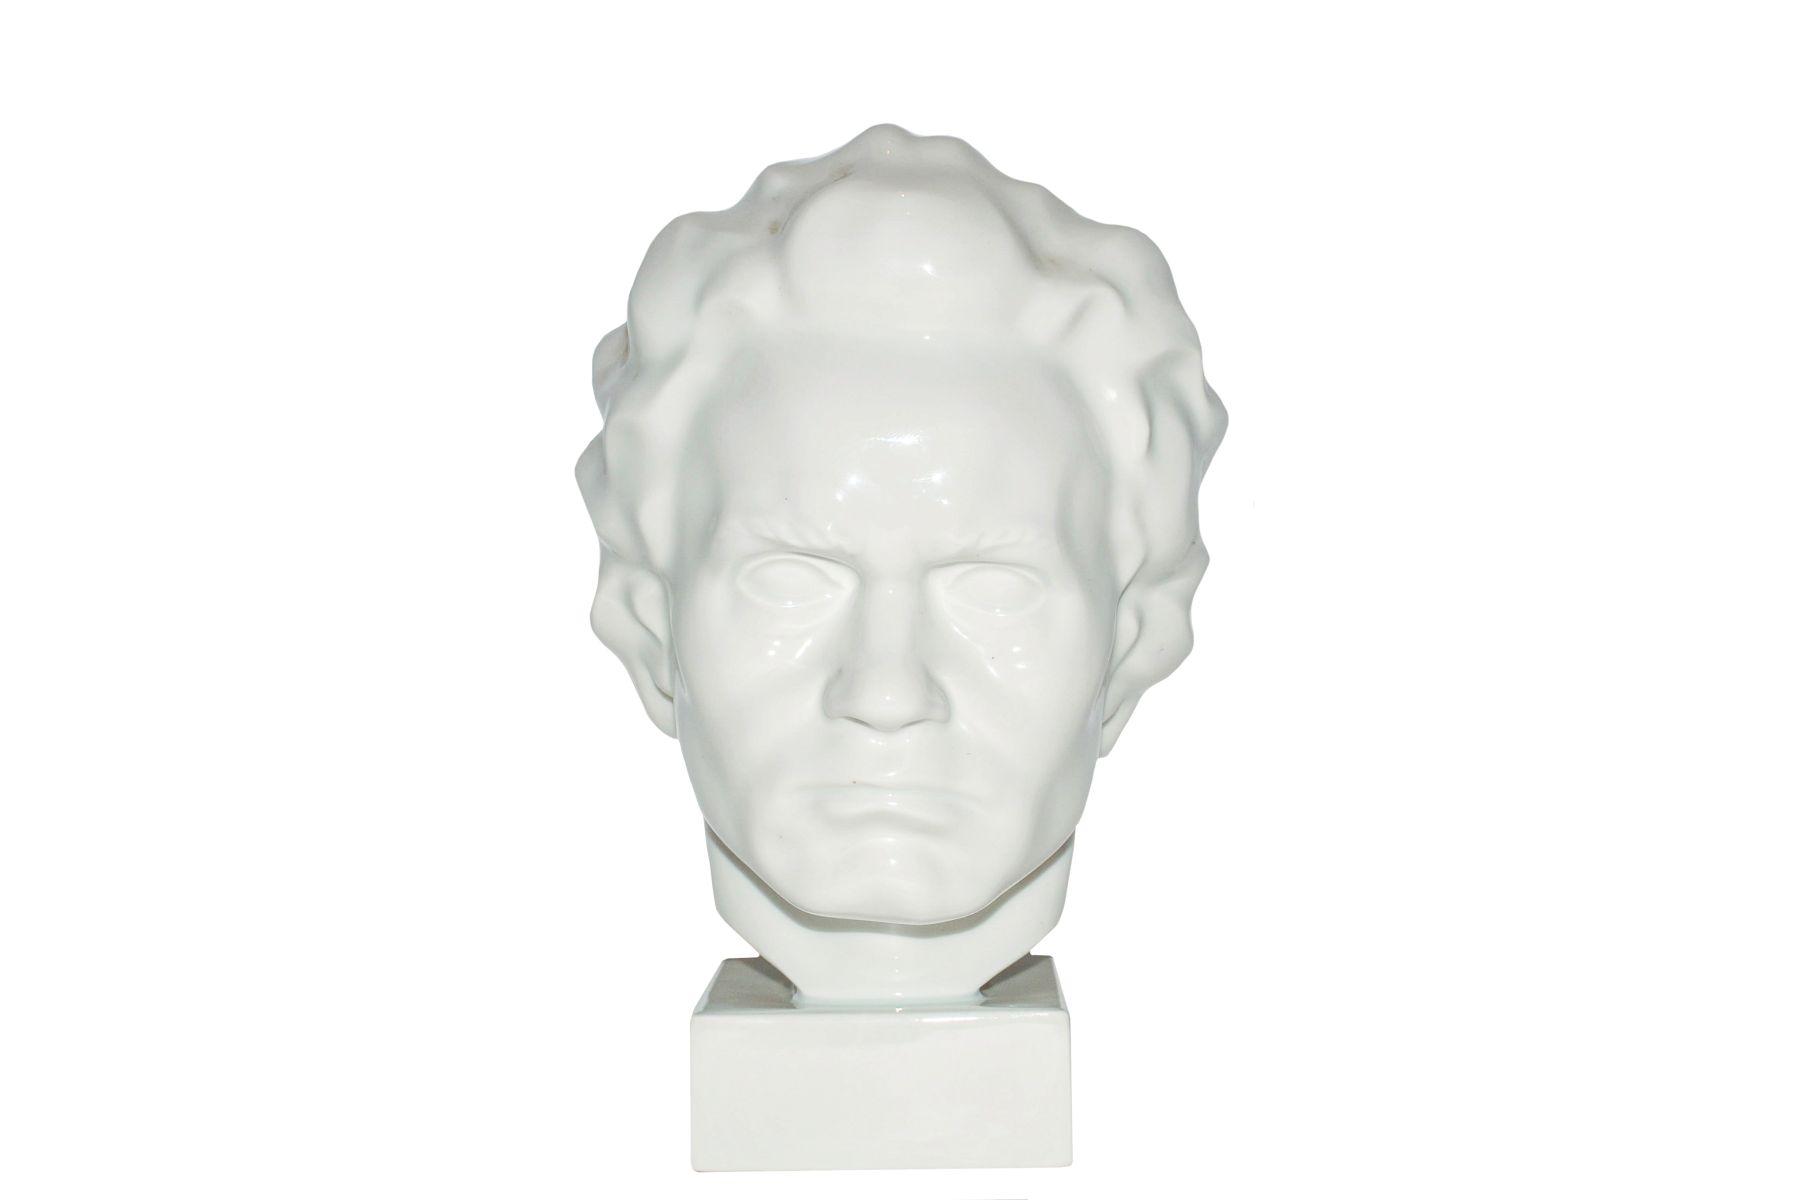 #142 Augarten bust Ludwig van Beethoven | Augarten Büste Ludwig van Beethoven Image